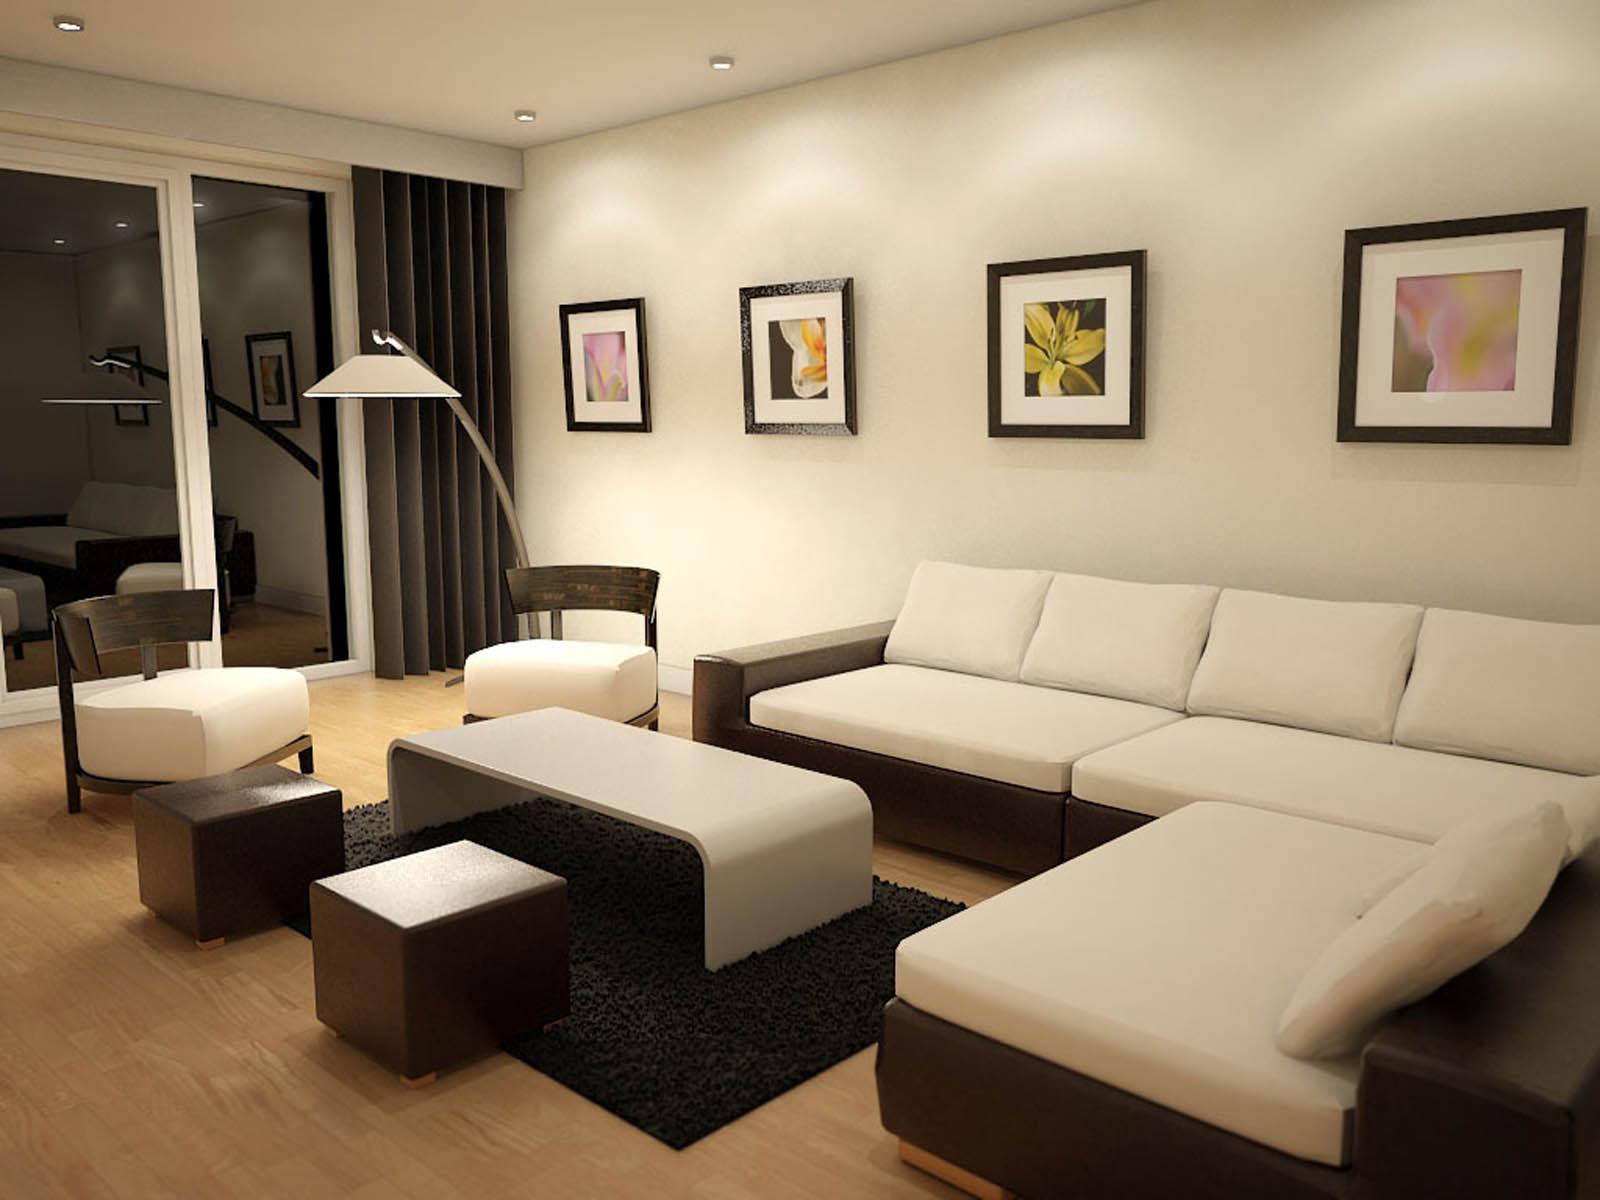 Keywords Modern Living Room Photos Wallpapers Desktop Backgrounds